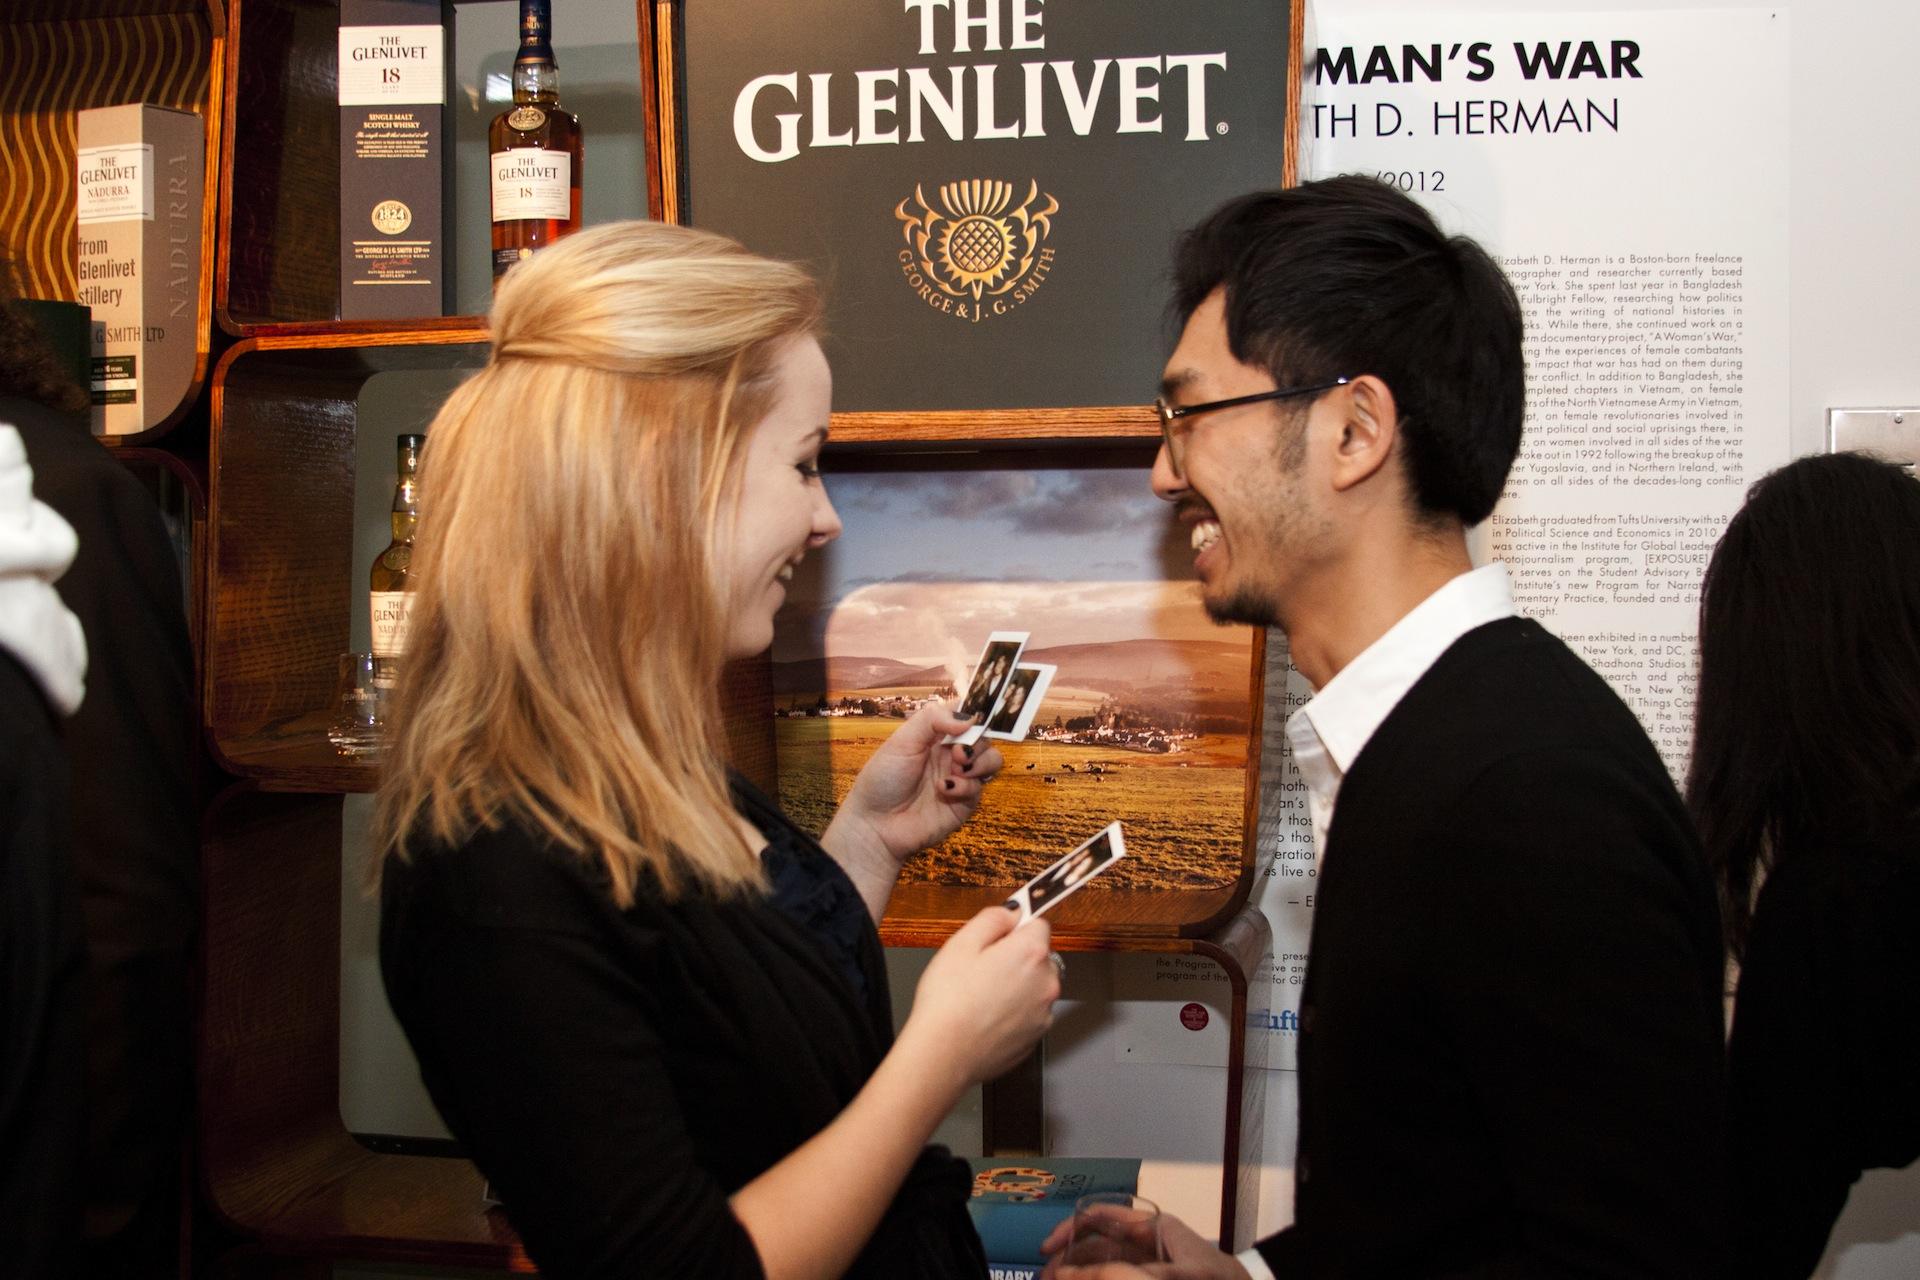 Glenlivet Scotch and Photography